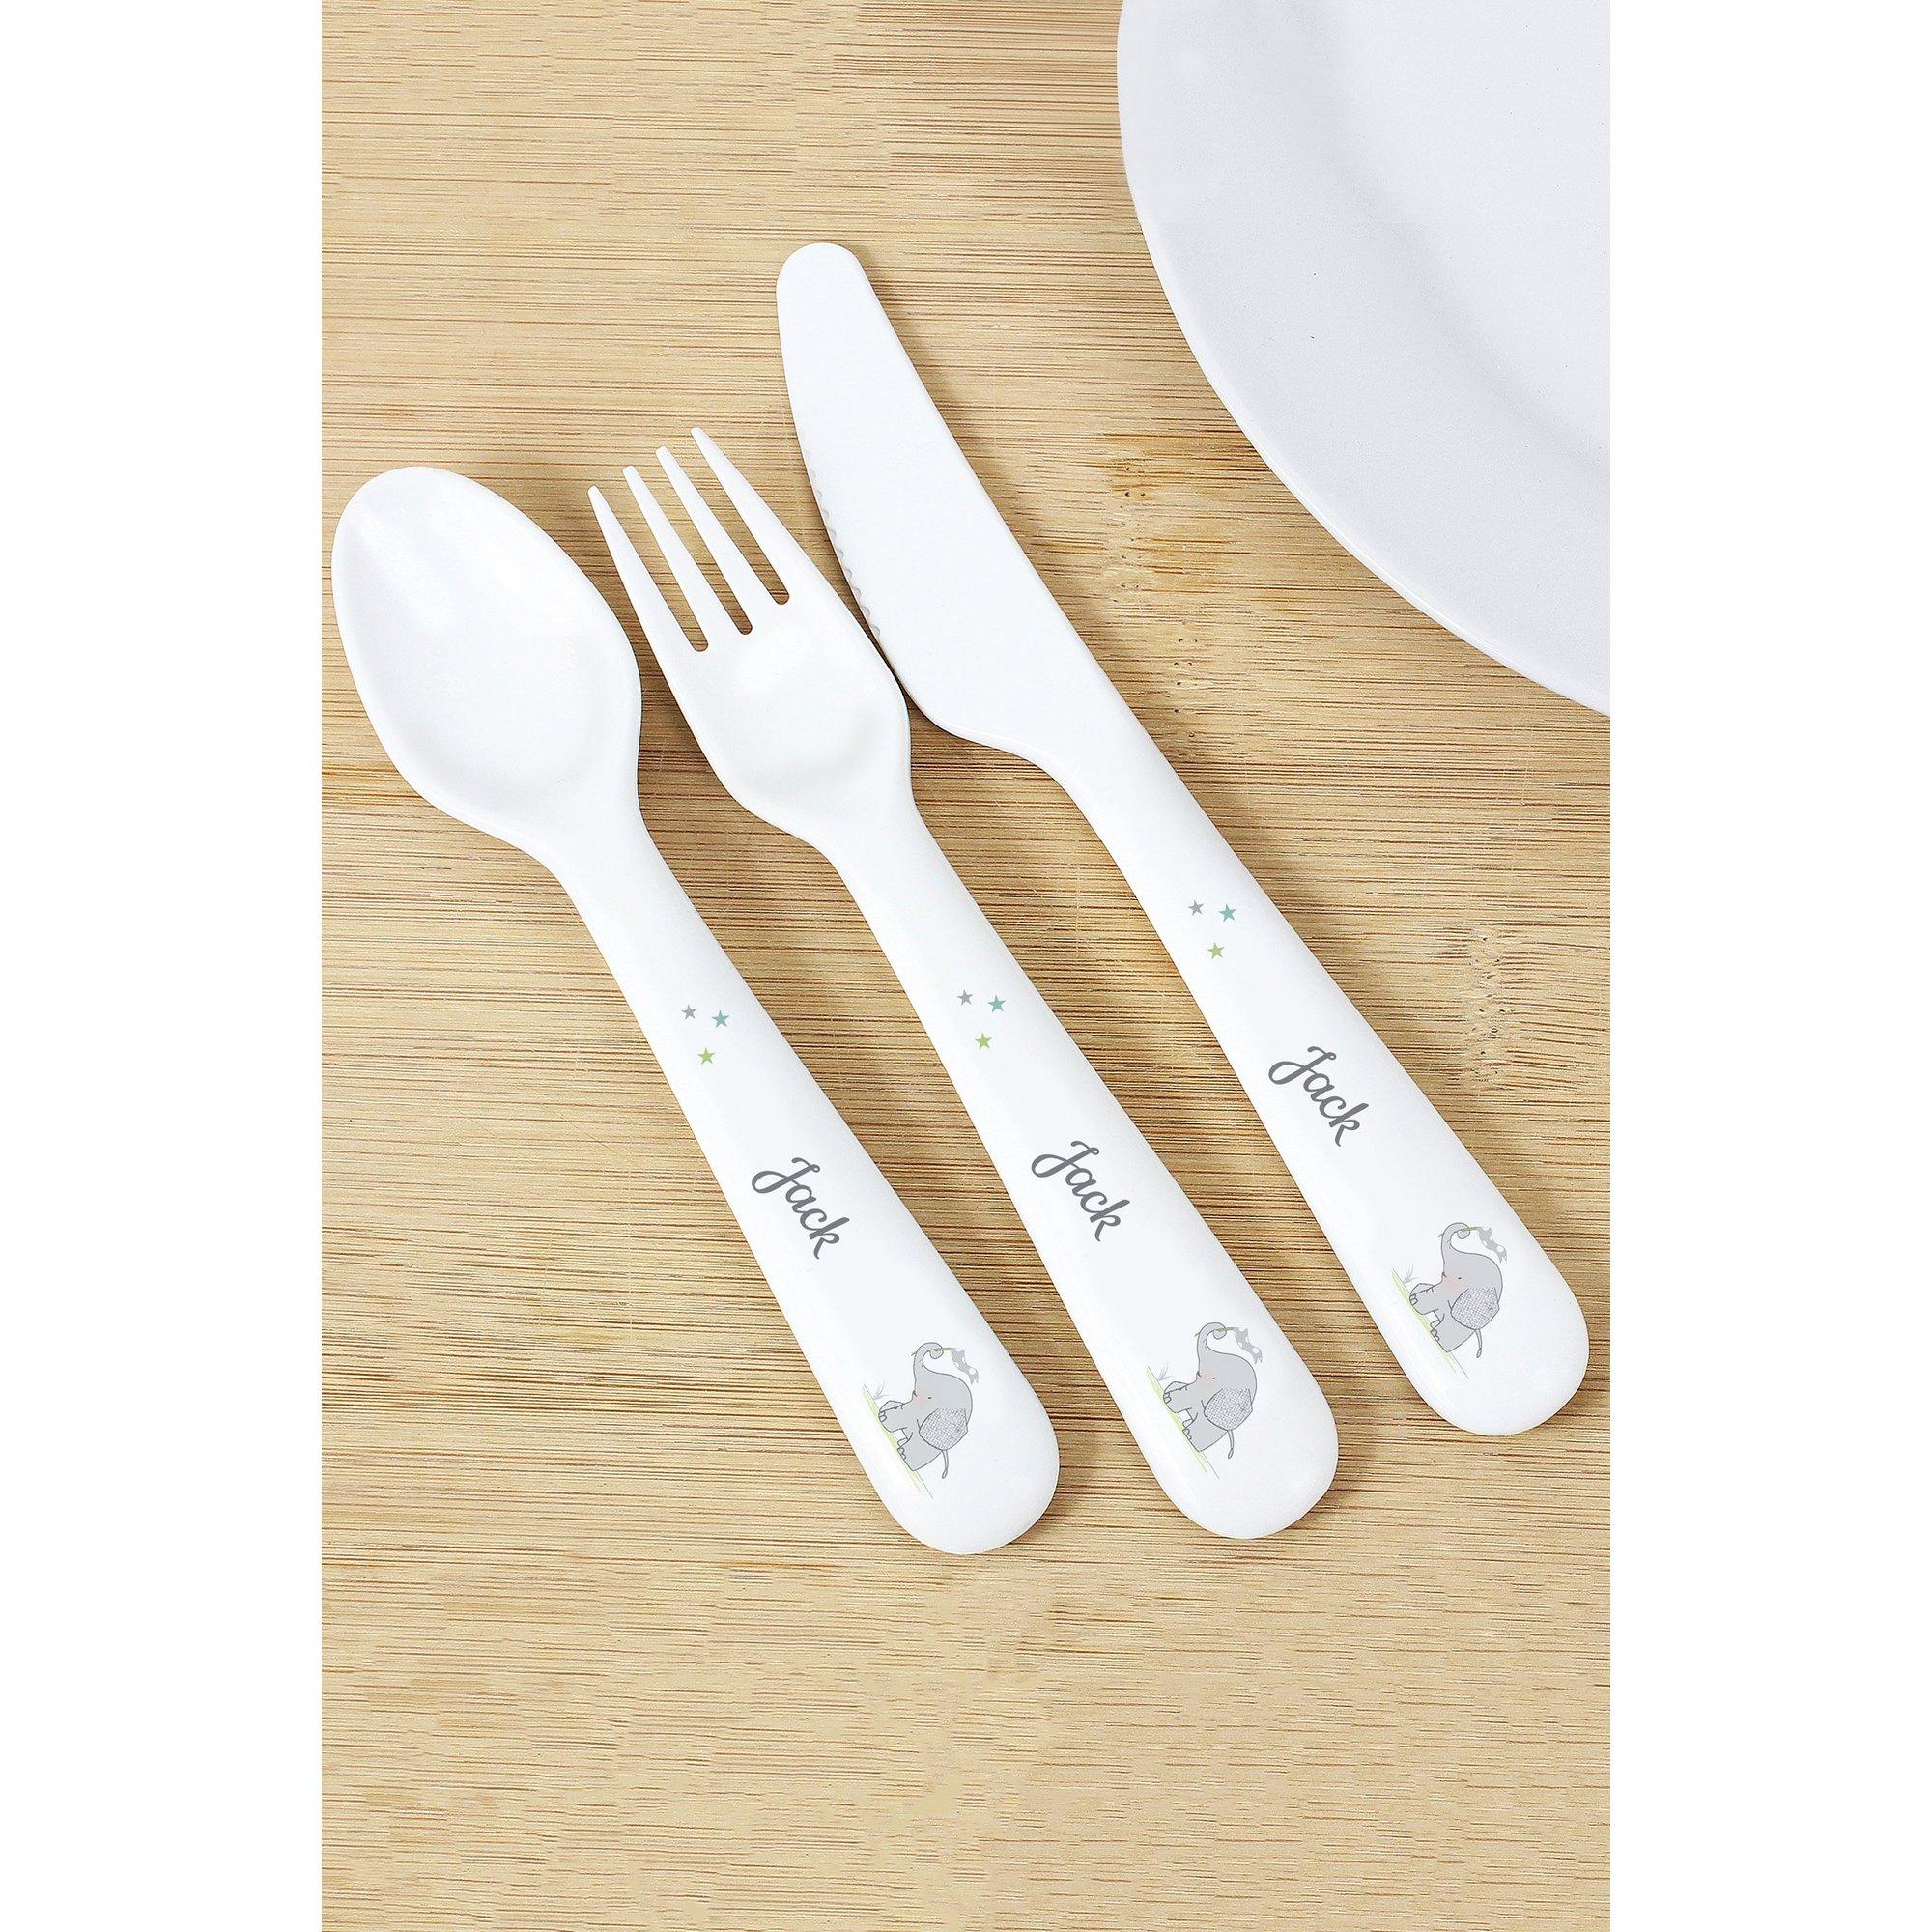 Image of Personalised Hessian Elephant 3 Piece Plastic Cutlery Set